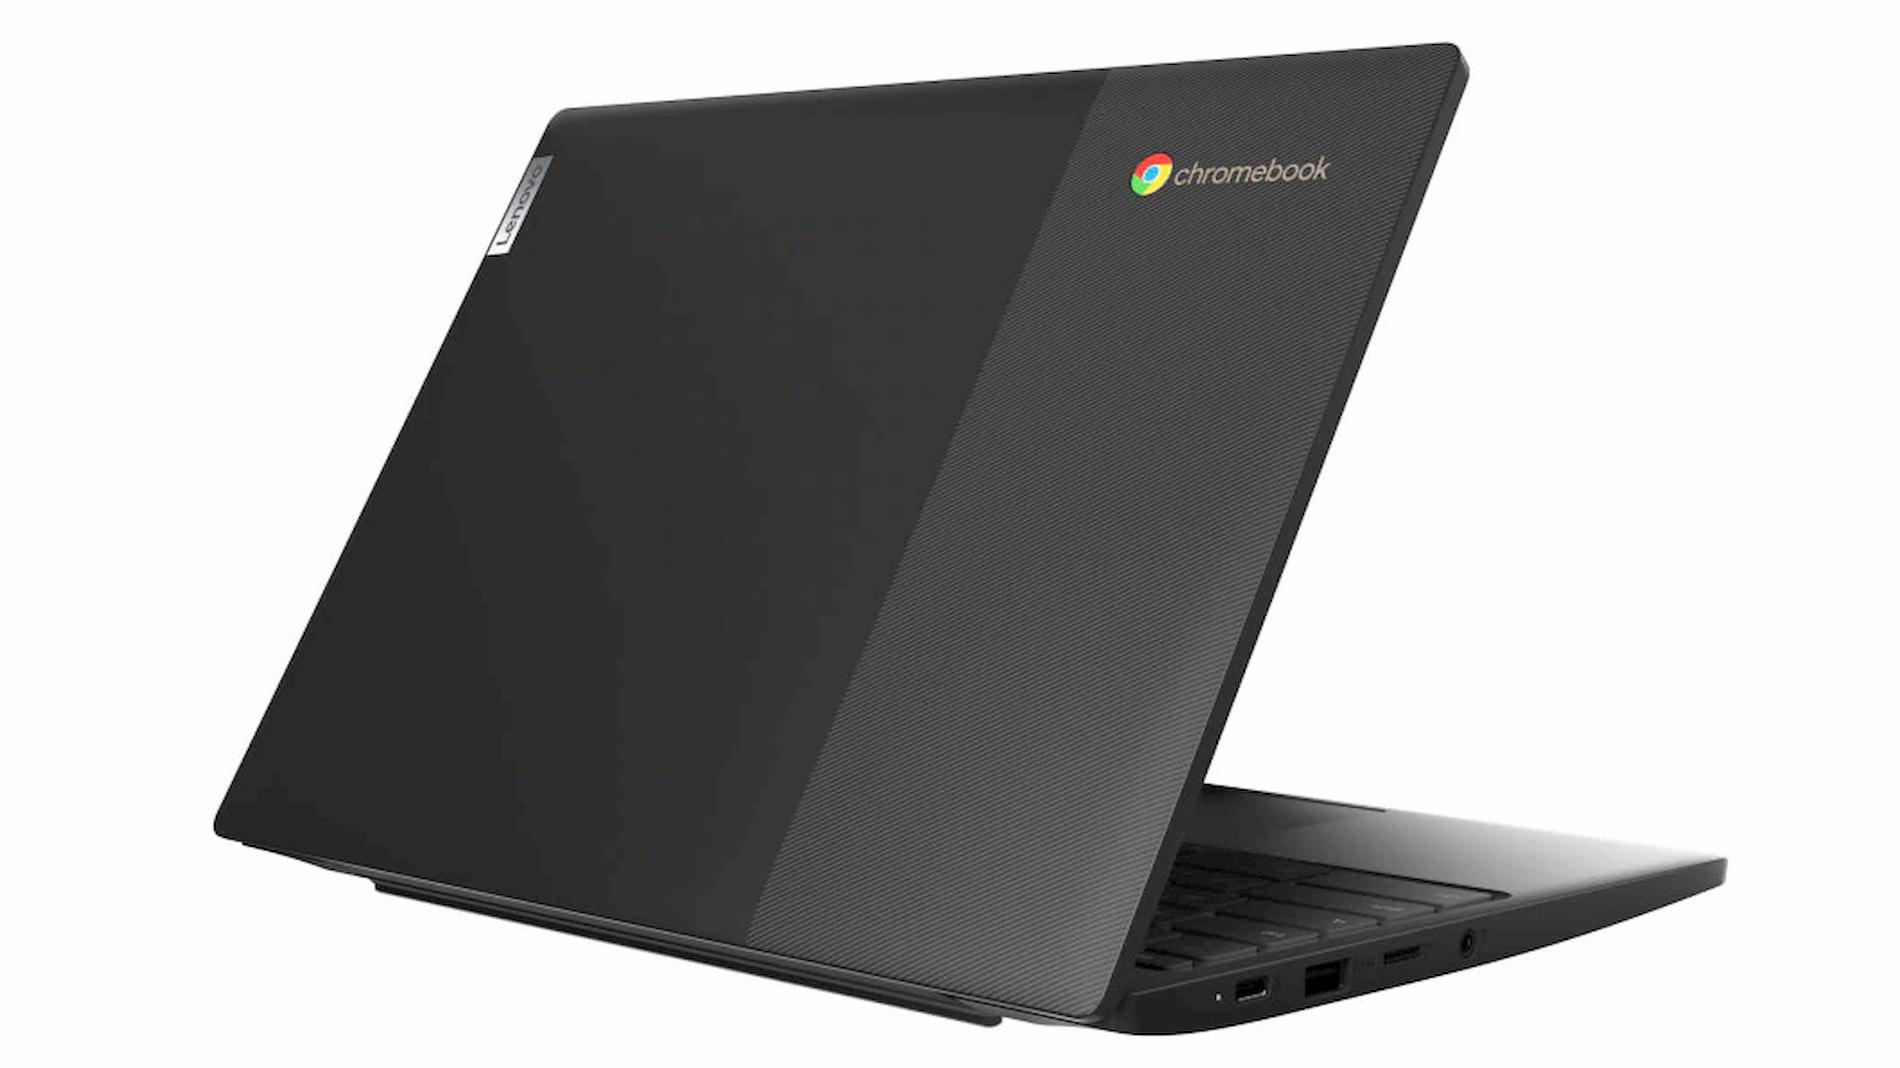 Lenovo releases smaller, better-equipped Chromebook 3 for only $229